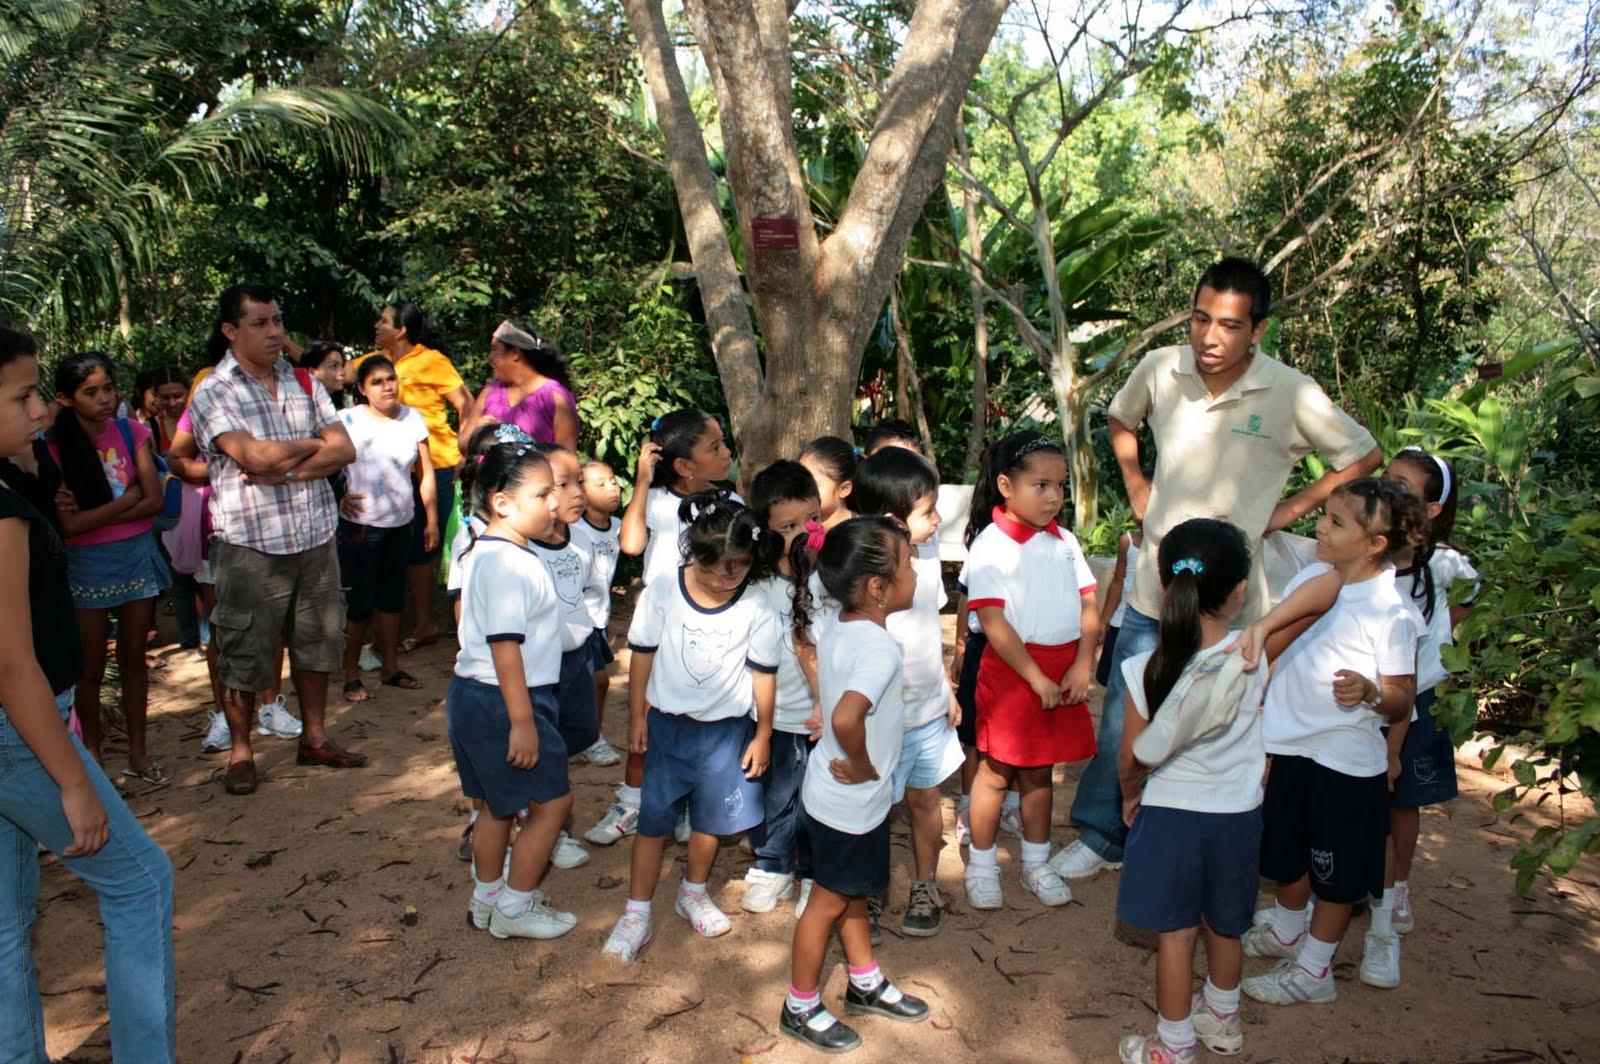 Jardin lucia alcocer acapulco excursi n al jardin for Jardin botanico talleres